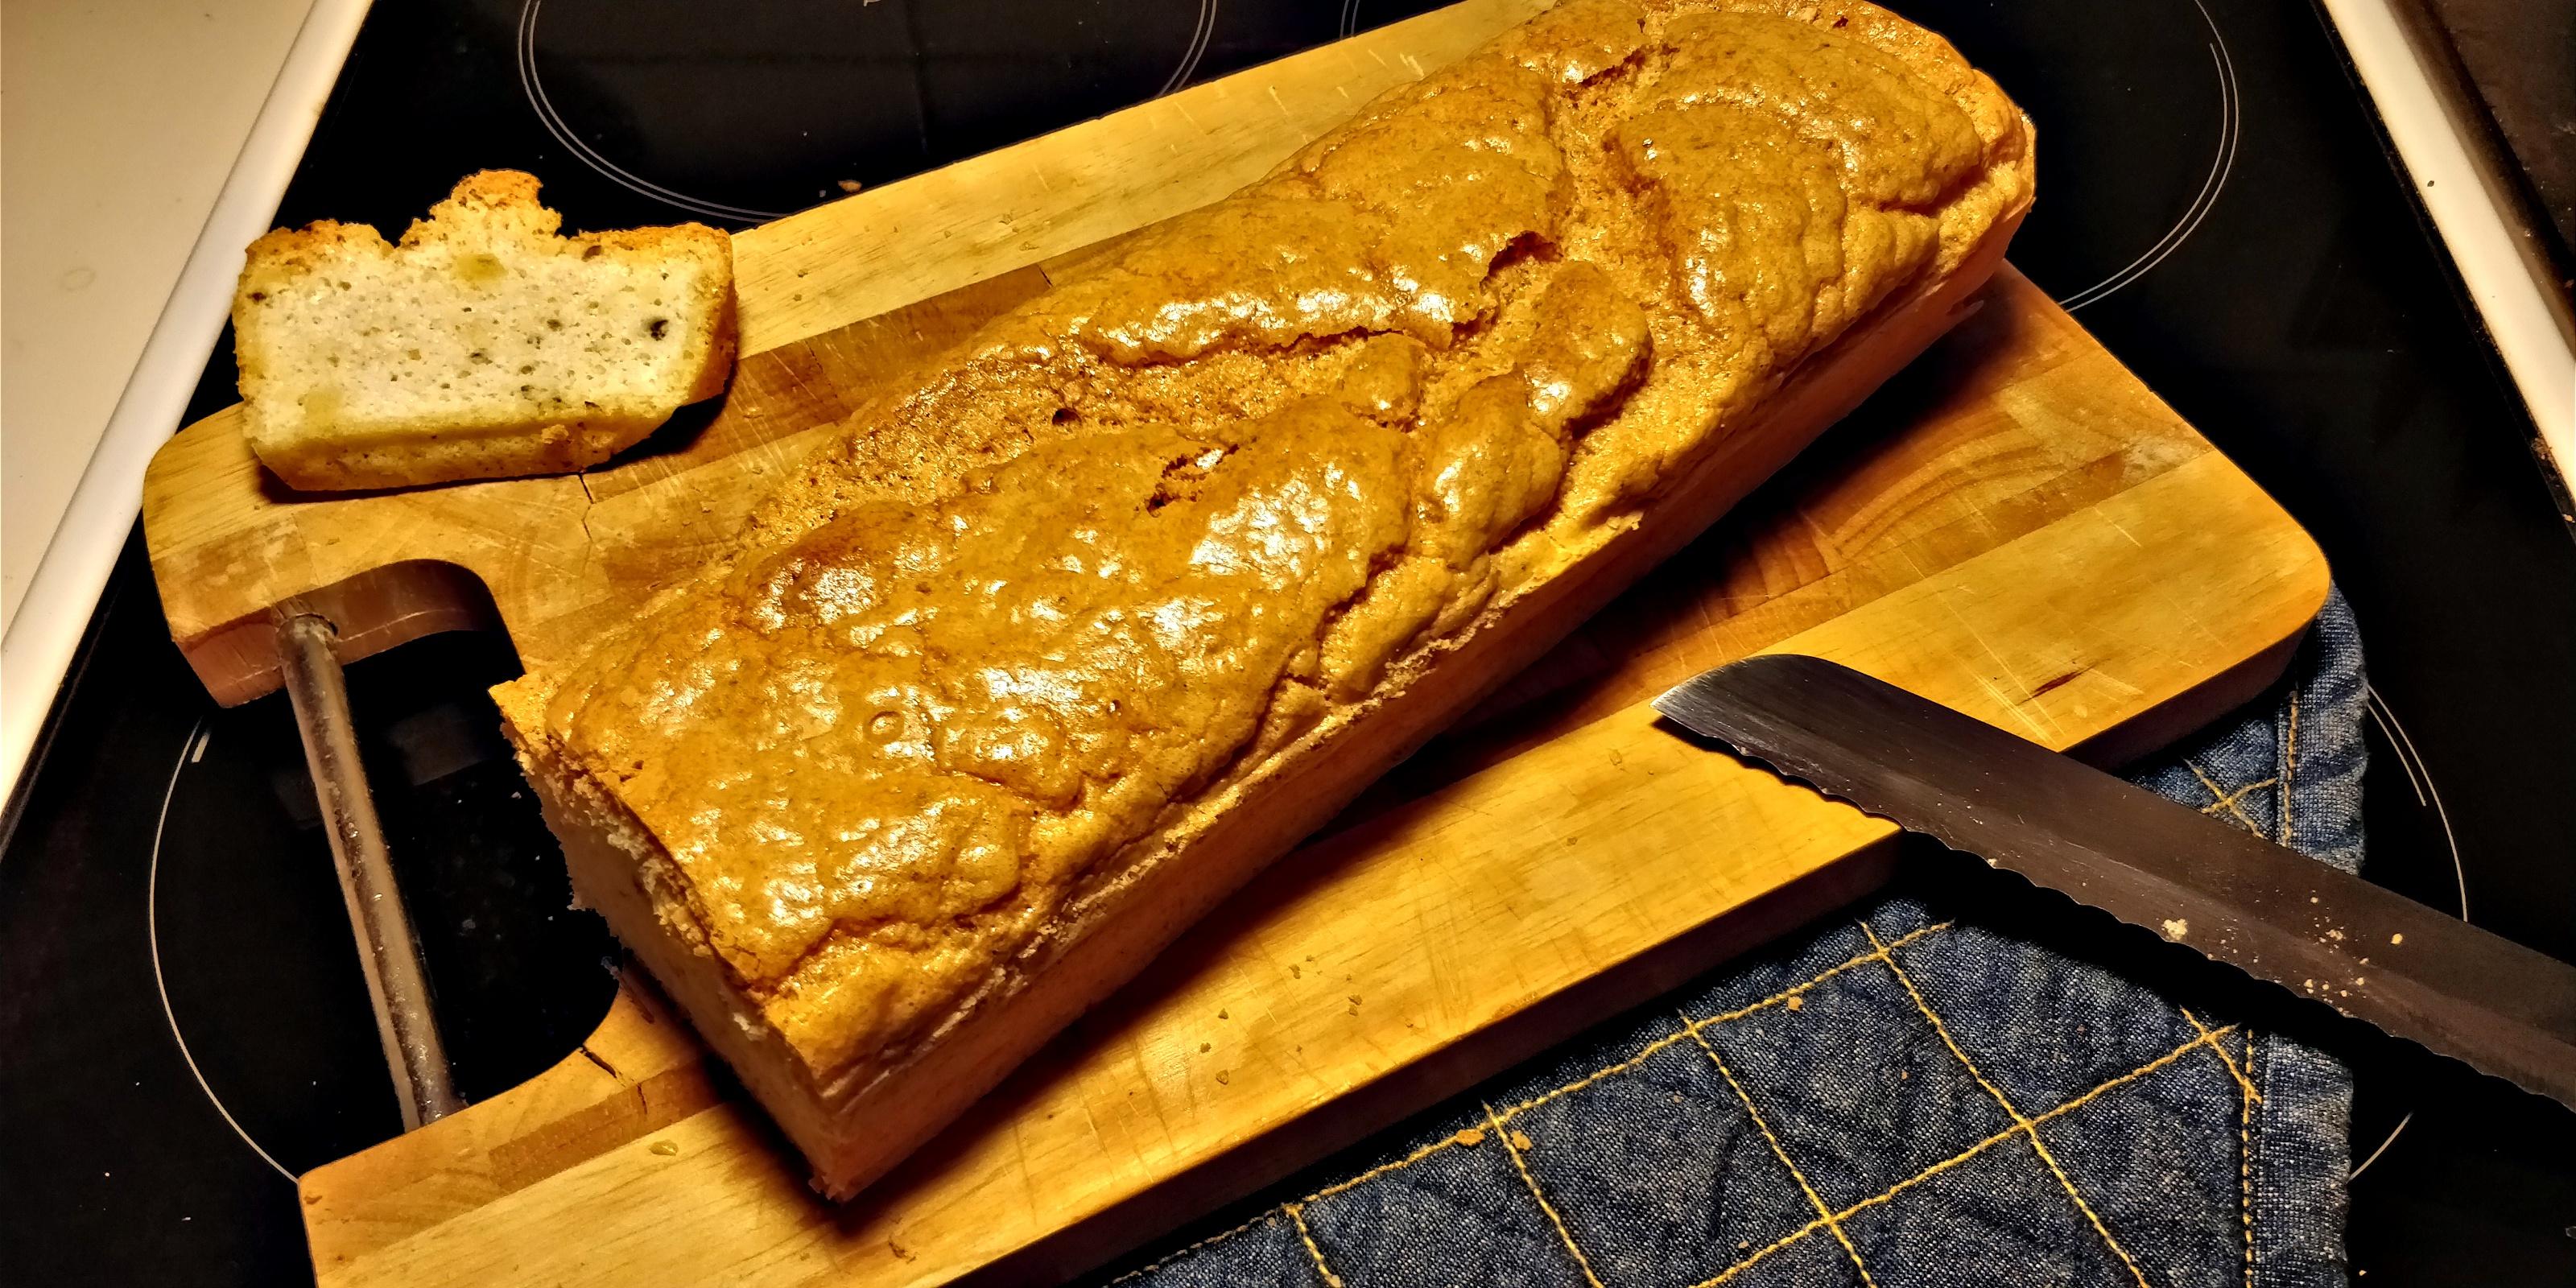 proteinbröd lchf recept